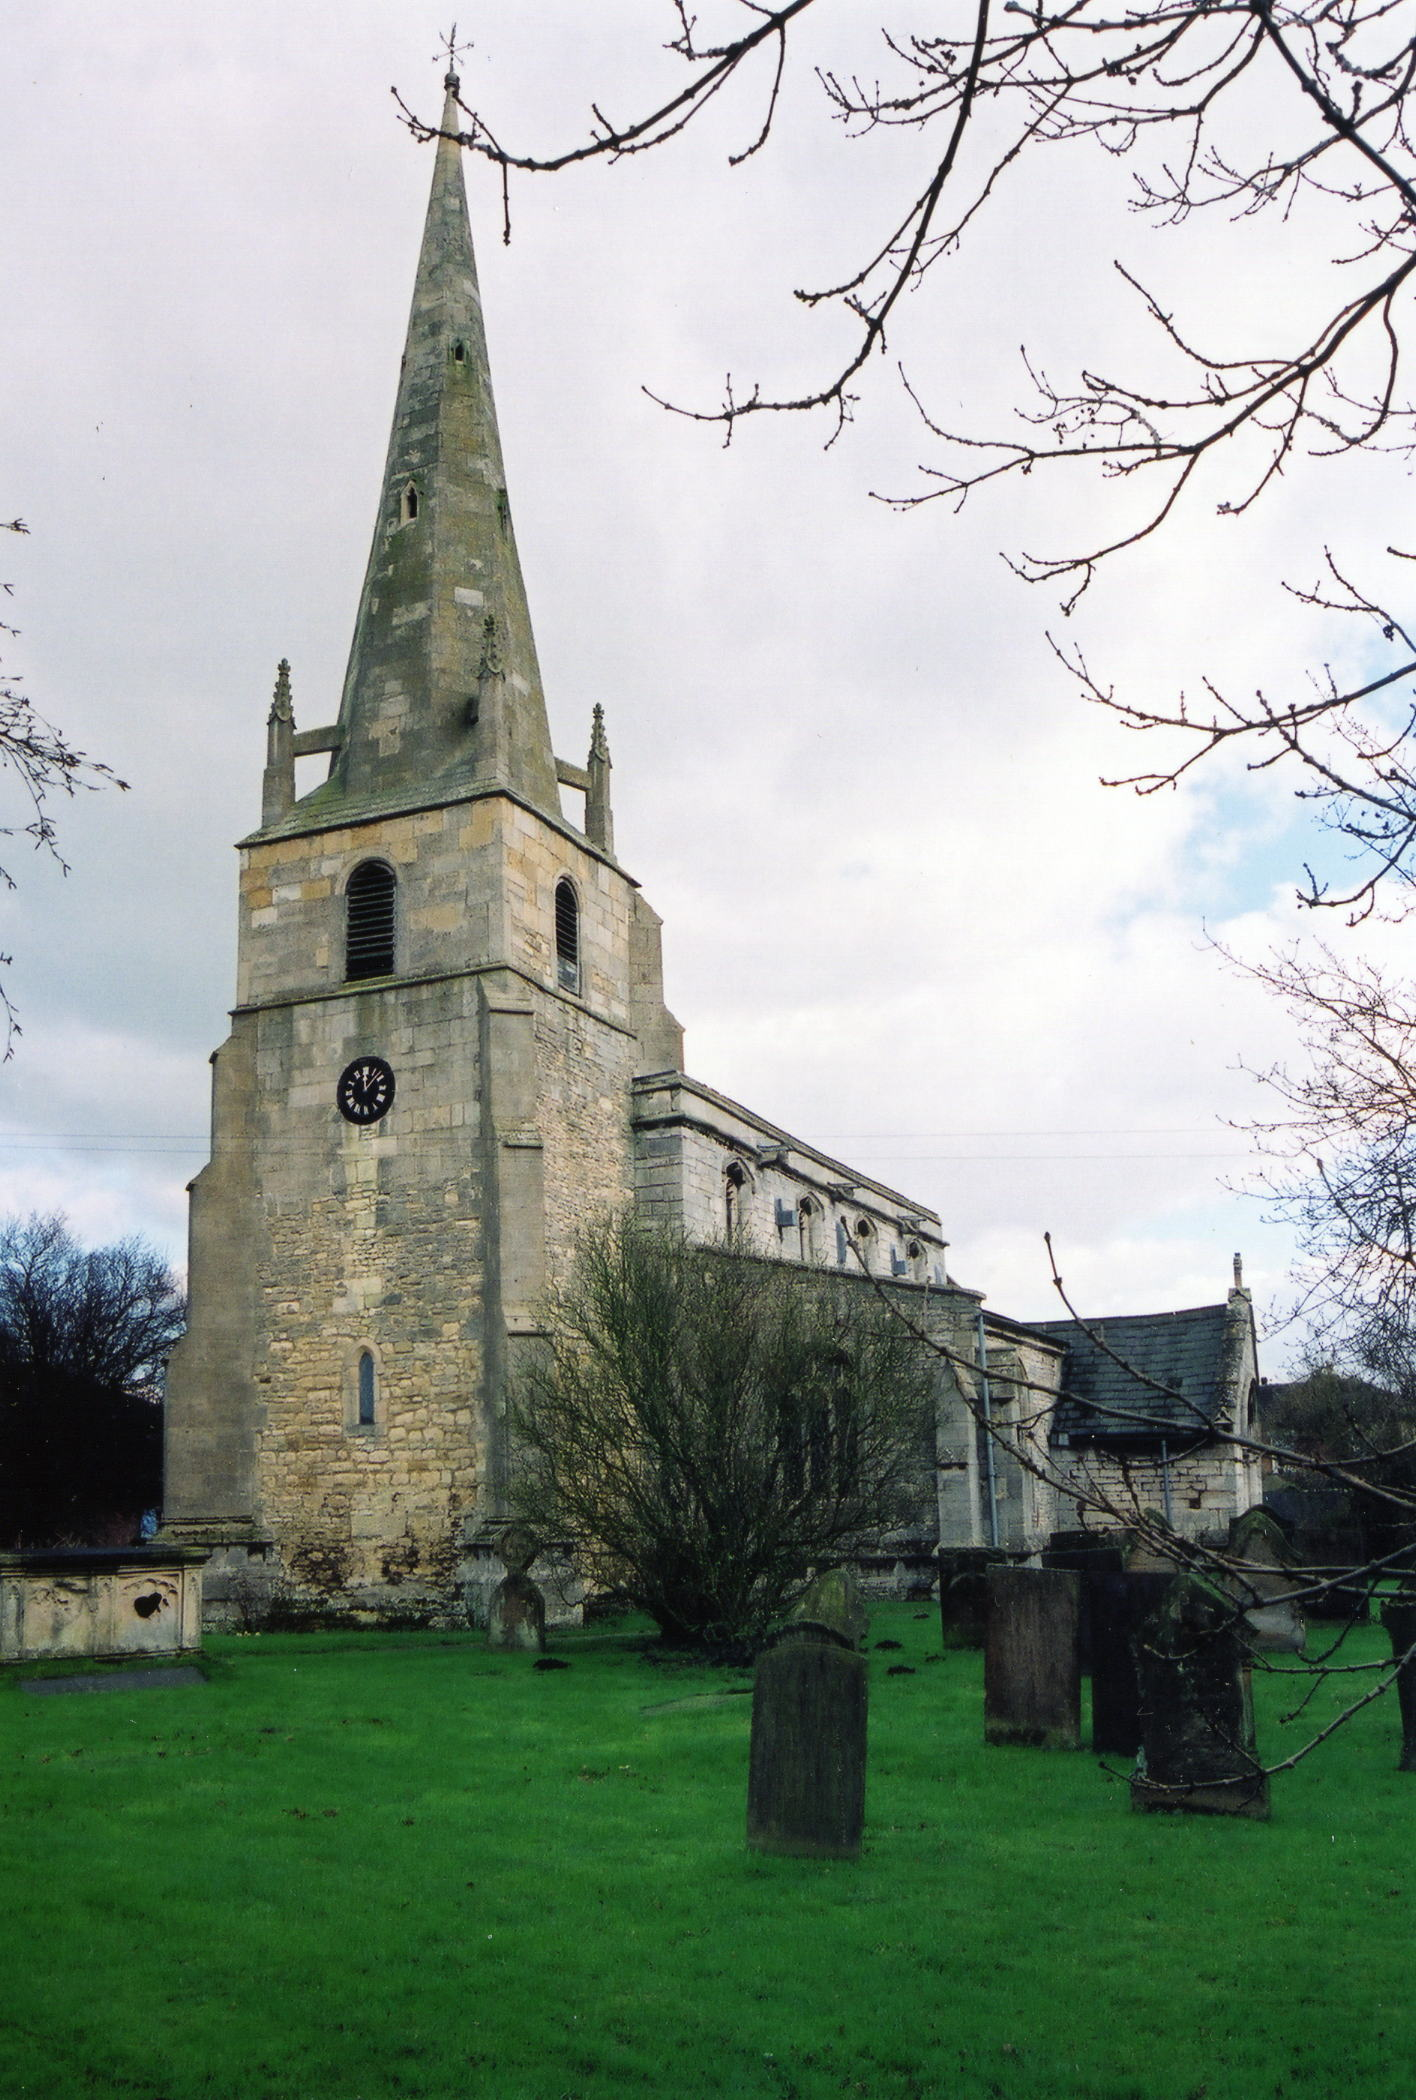 Billinghay St. Michael parish church